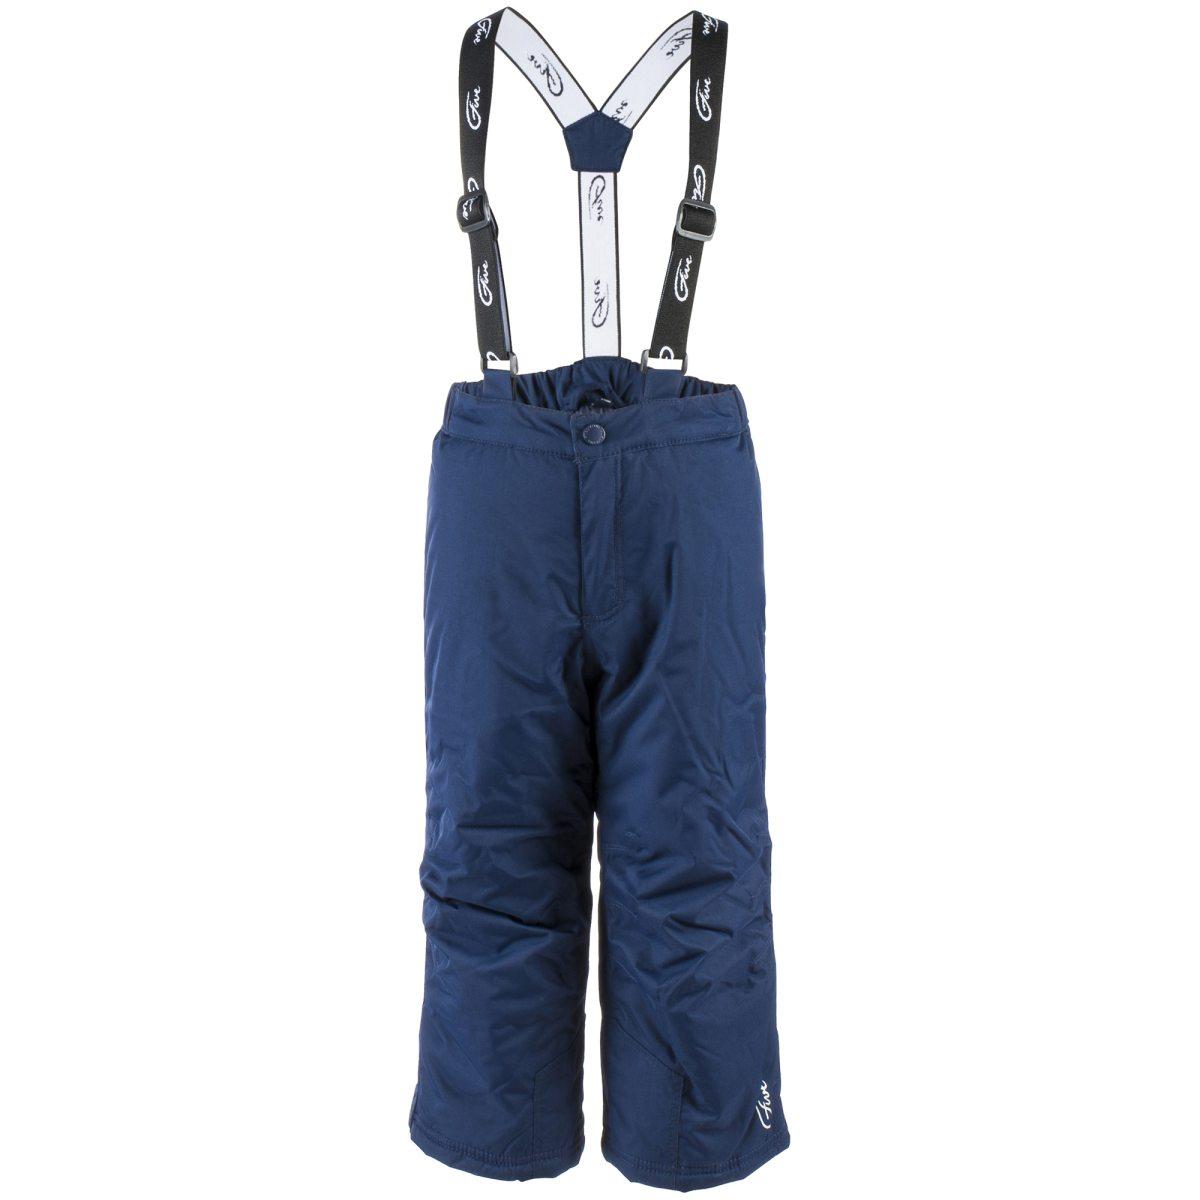 aac509a9 marine blå five seasons icy pant vinterbukse barn ski og snowboardbukser no